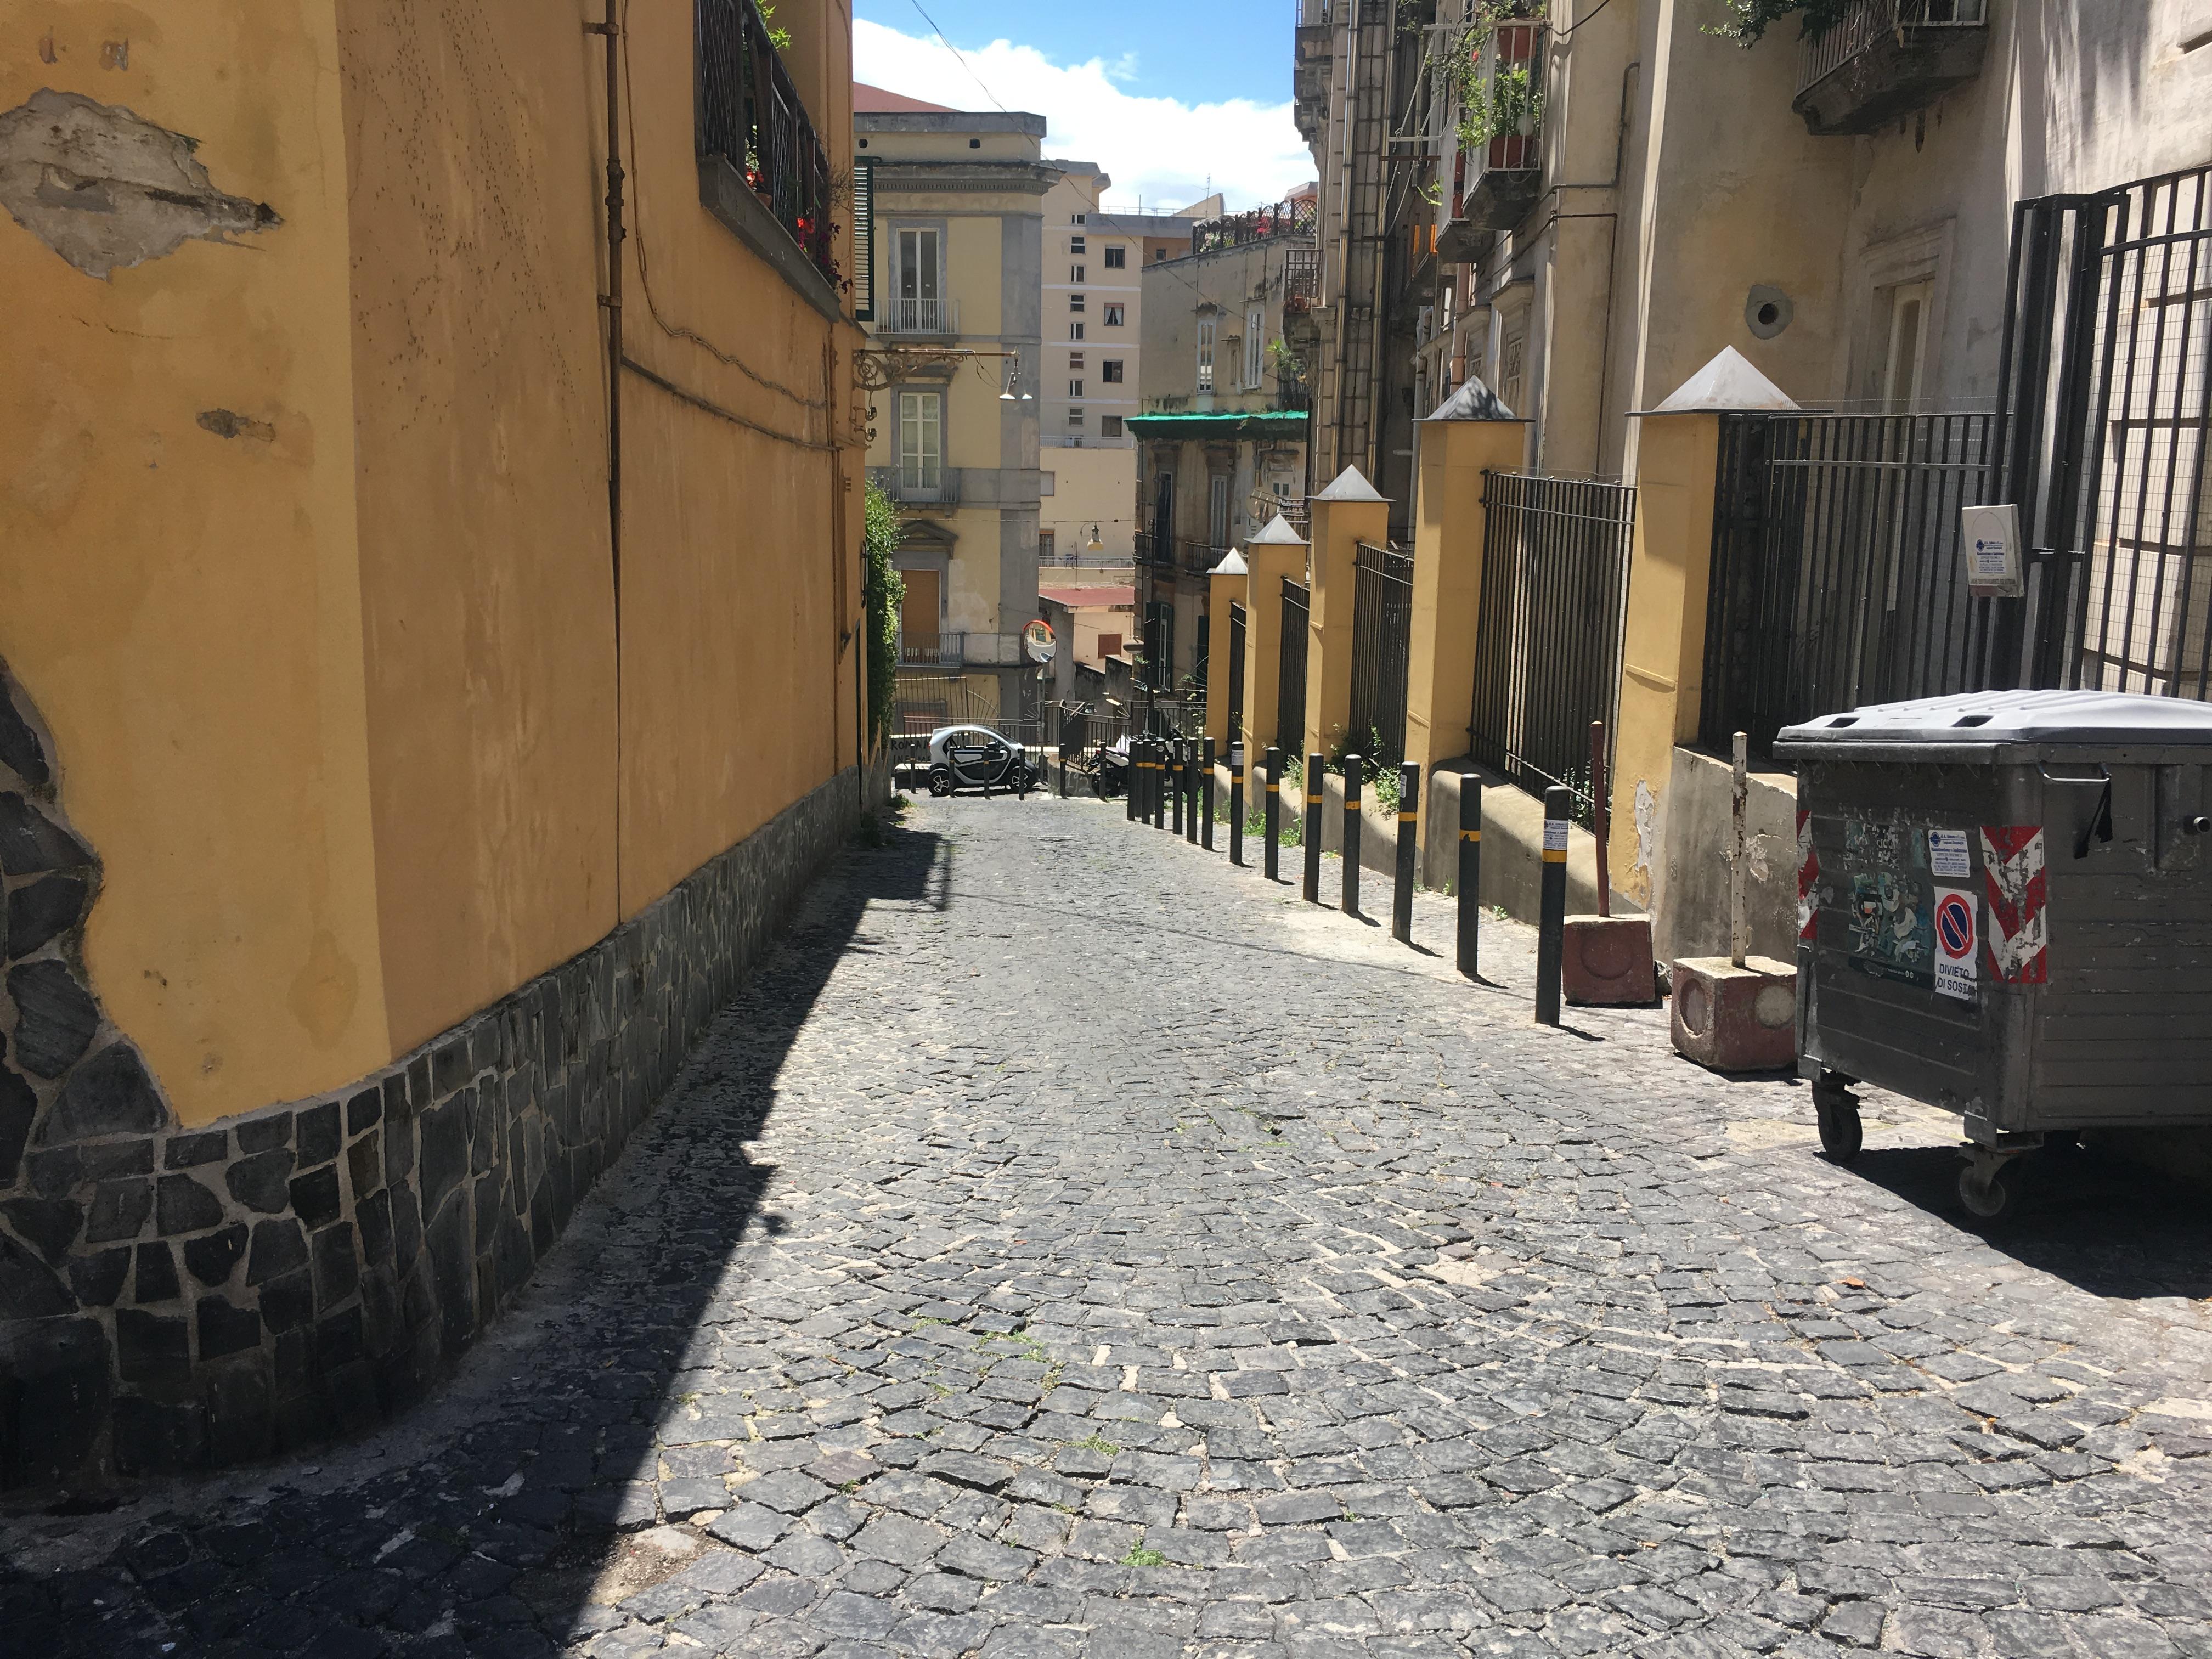 Chiaia – Corso Vittorio Emanuele